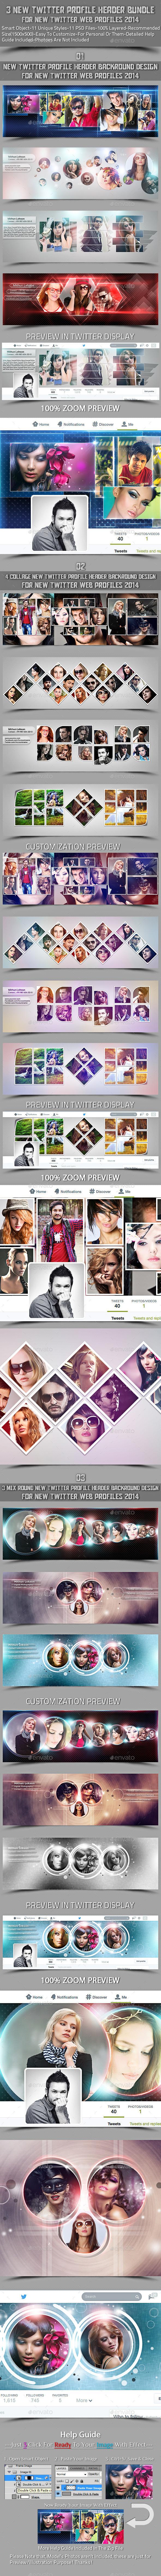 3 New Twitter Profile Header Bundle - Twitter Social Media